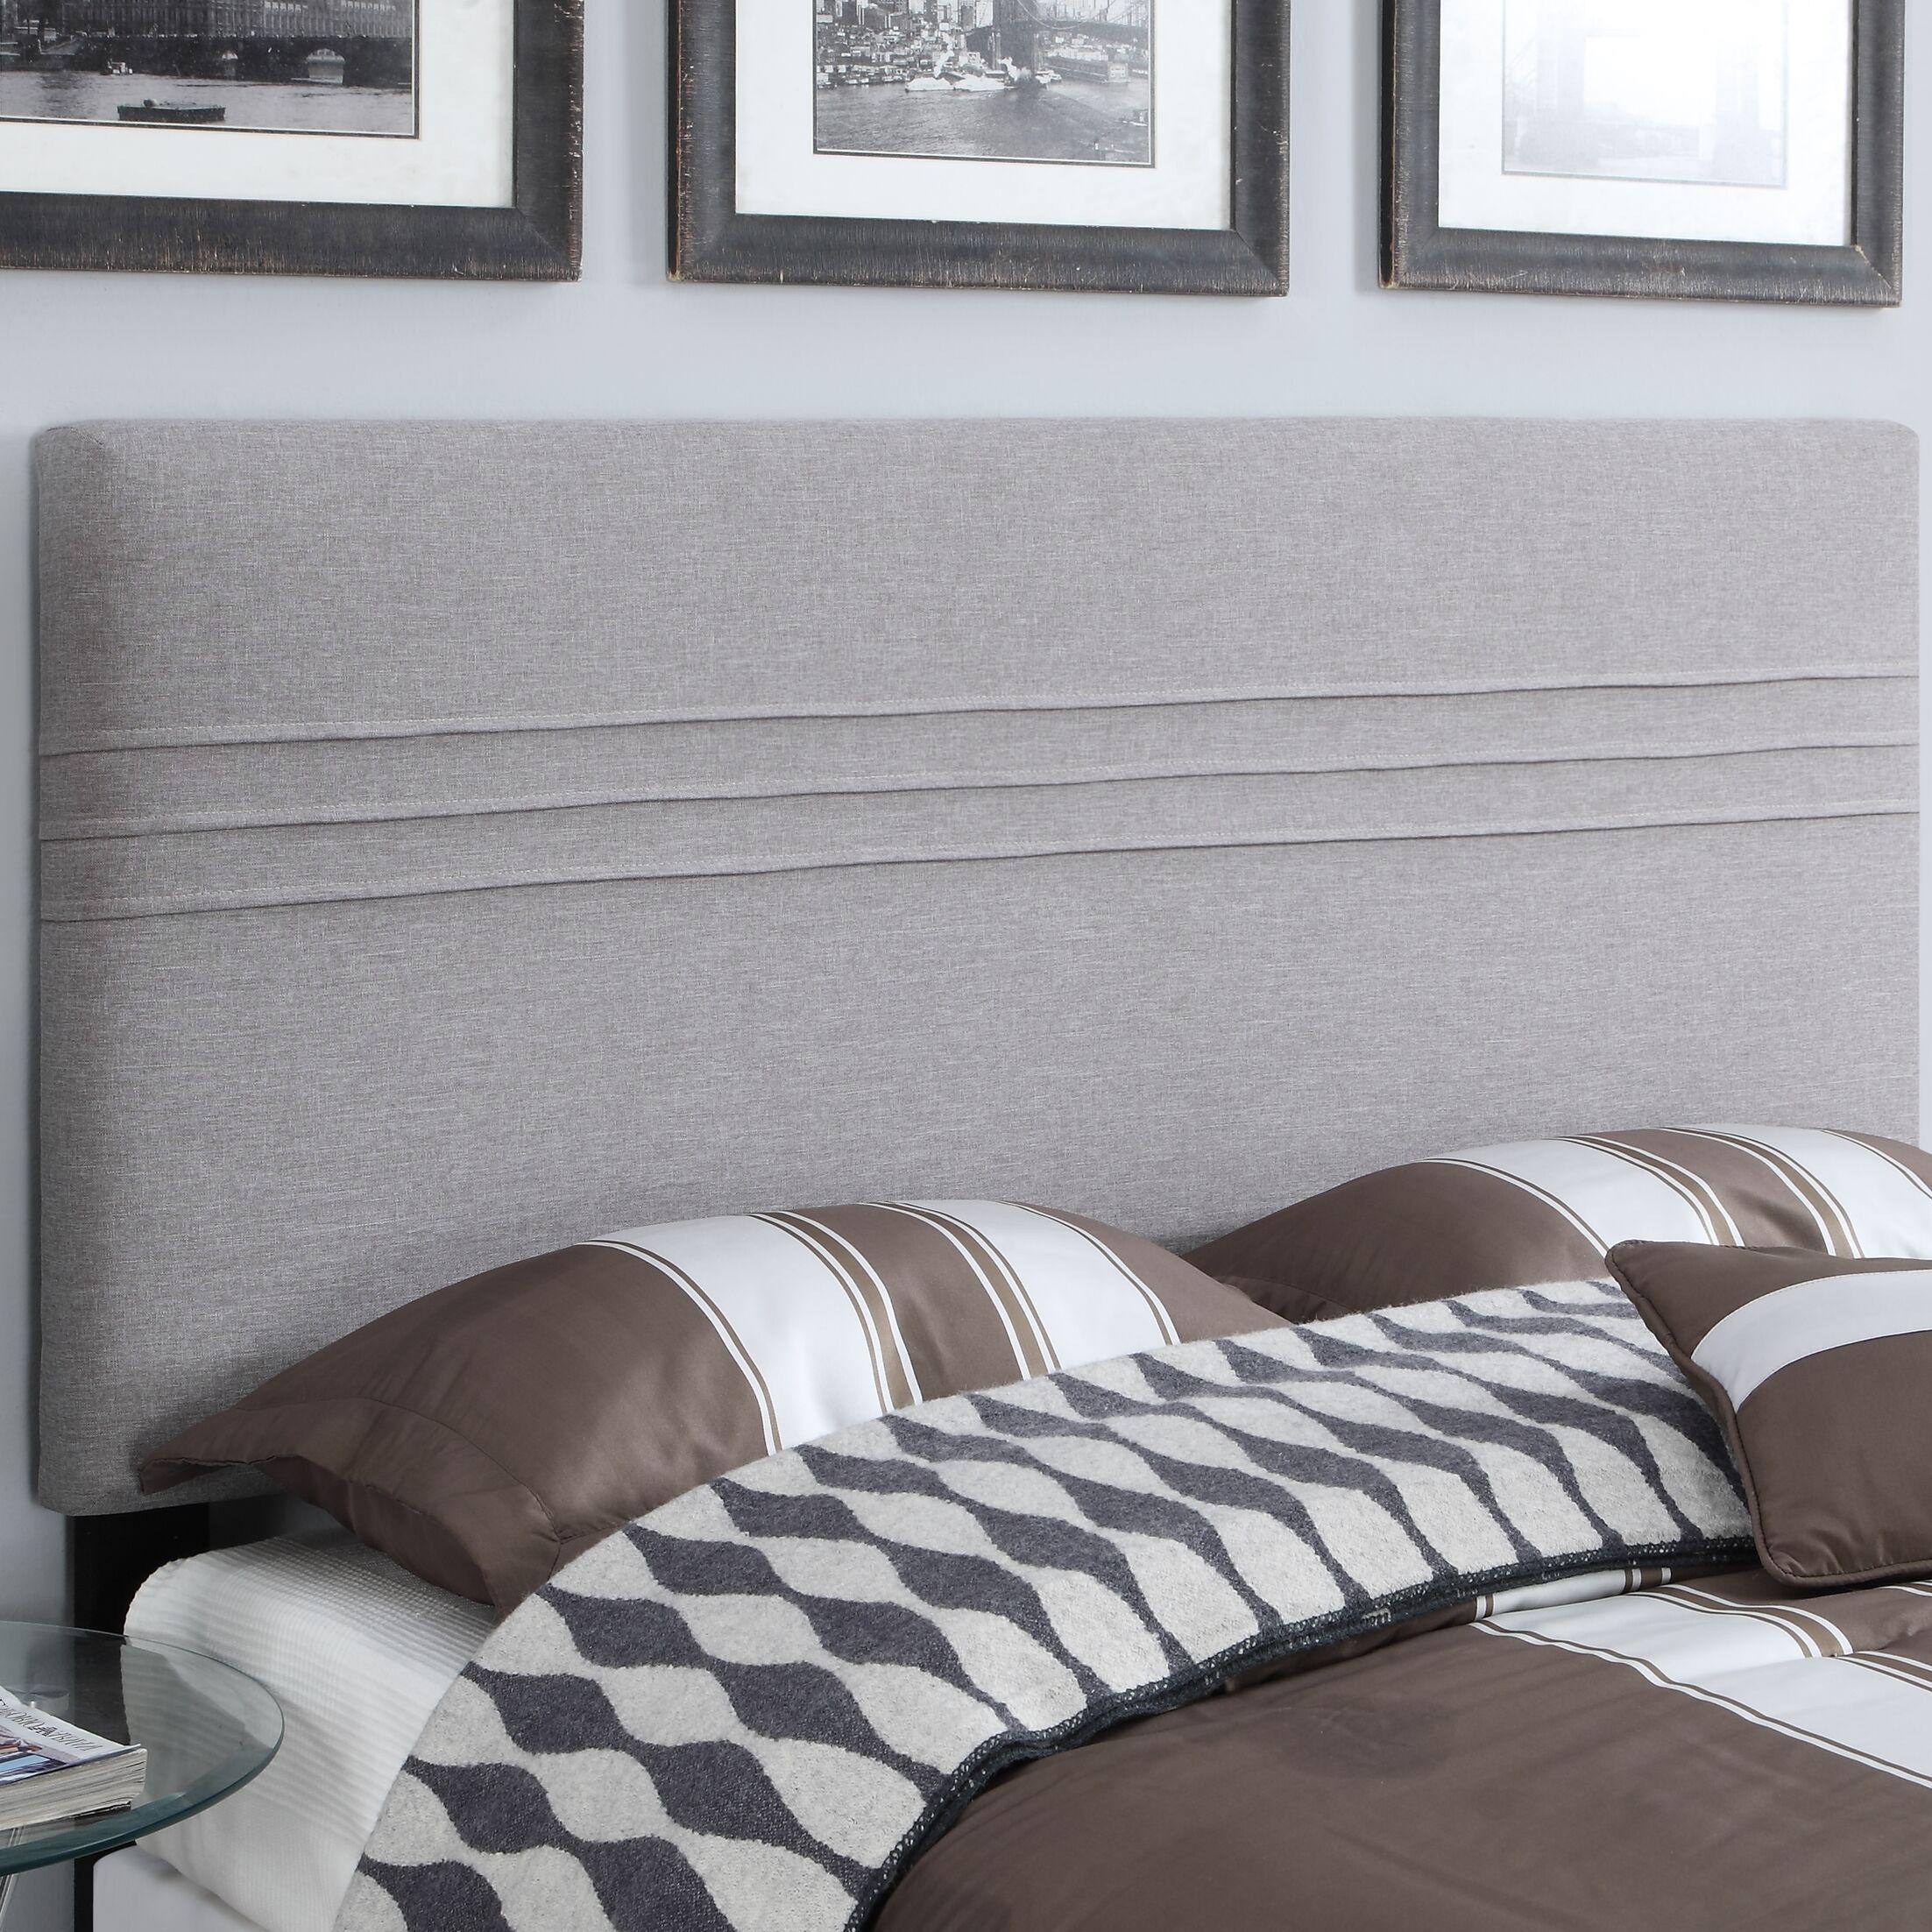 Hadleigh Upholstered Panel Headboard Size: King/California King, Upholstery: Hayden Silver